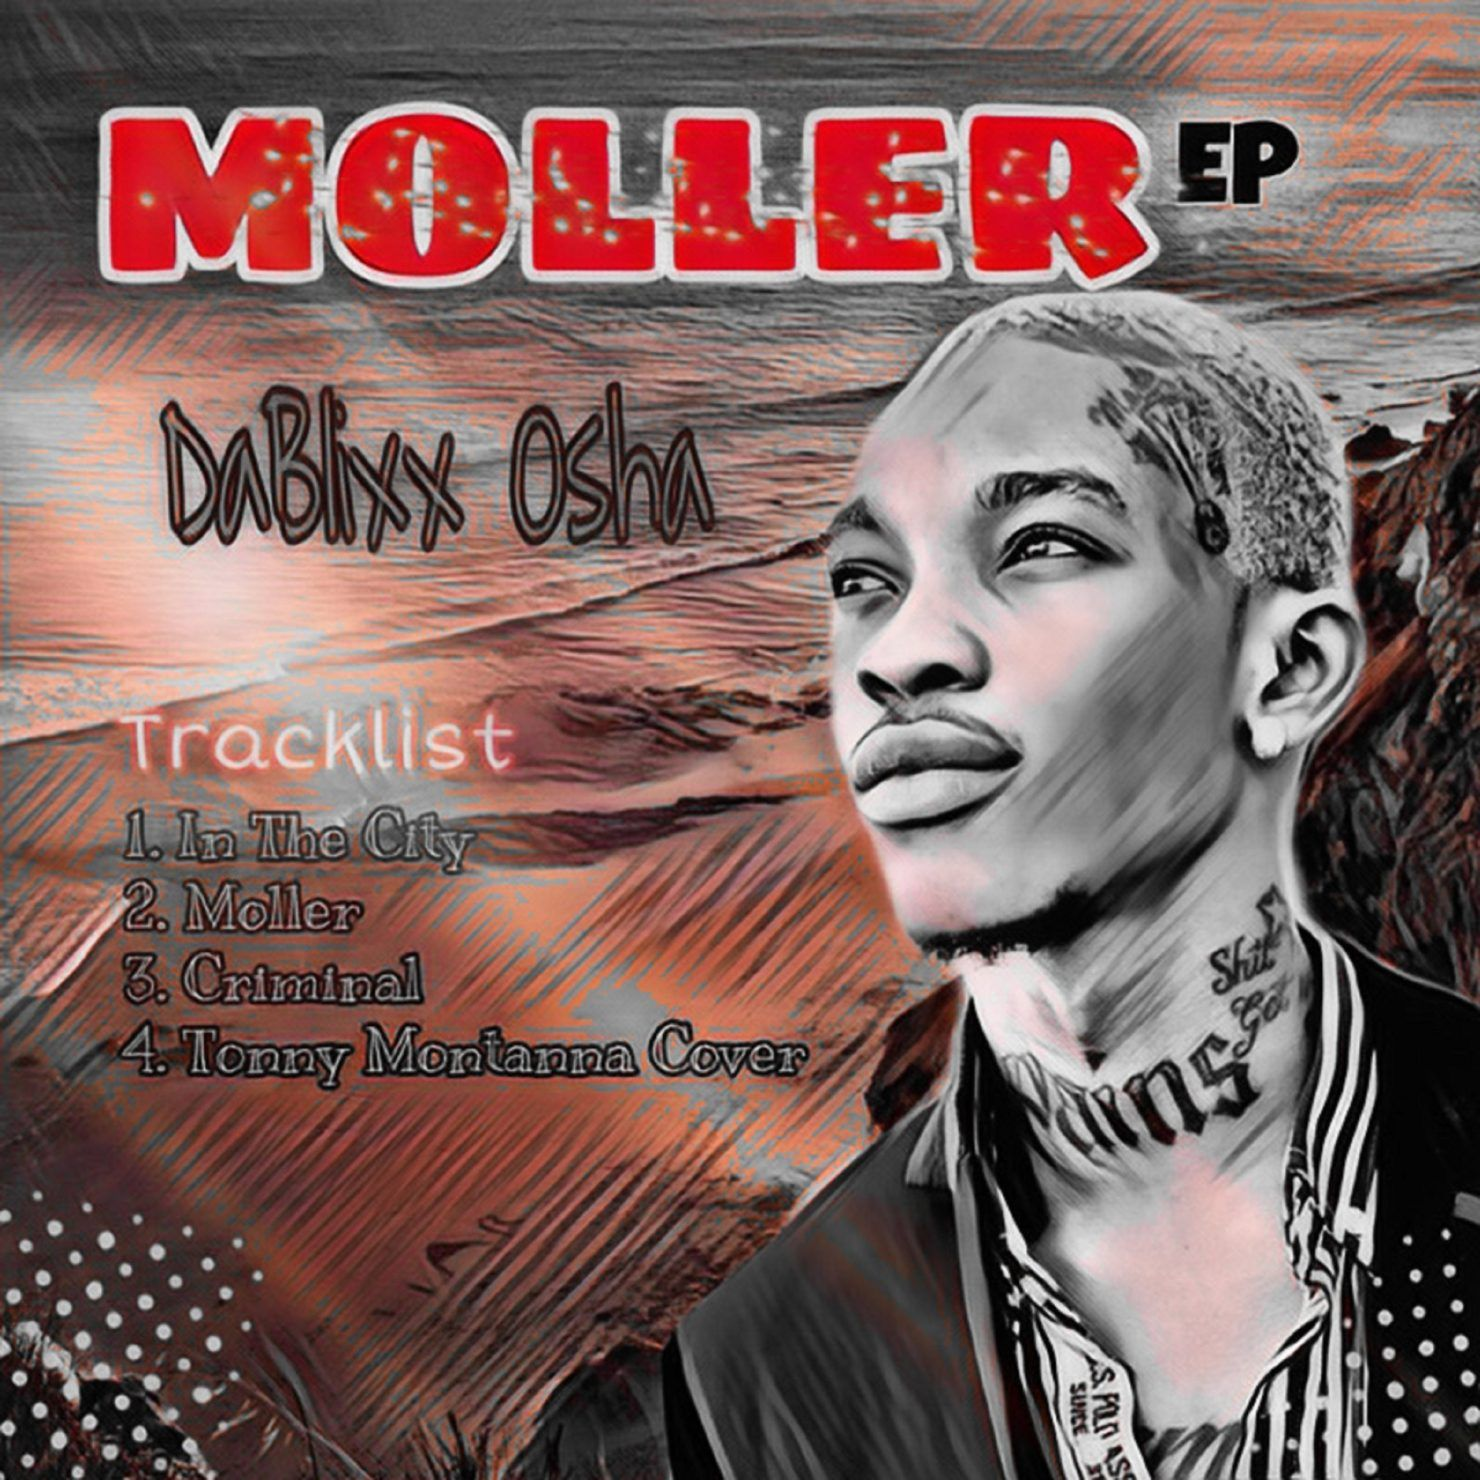 Music Dablixx Osha Criminal Mp3 Download Moller Ep Sureloaded In 2020 South African Hip Hop Comedy Skits Hip Hop Music